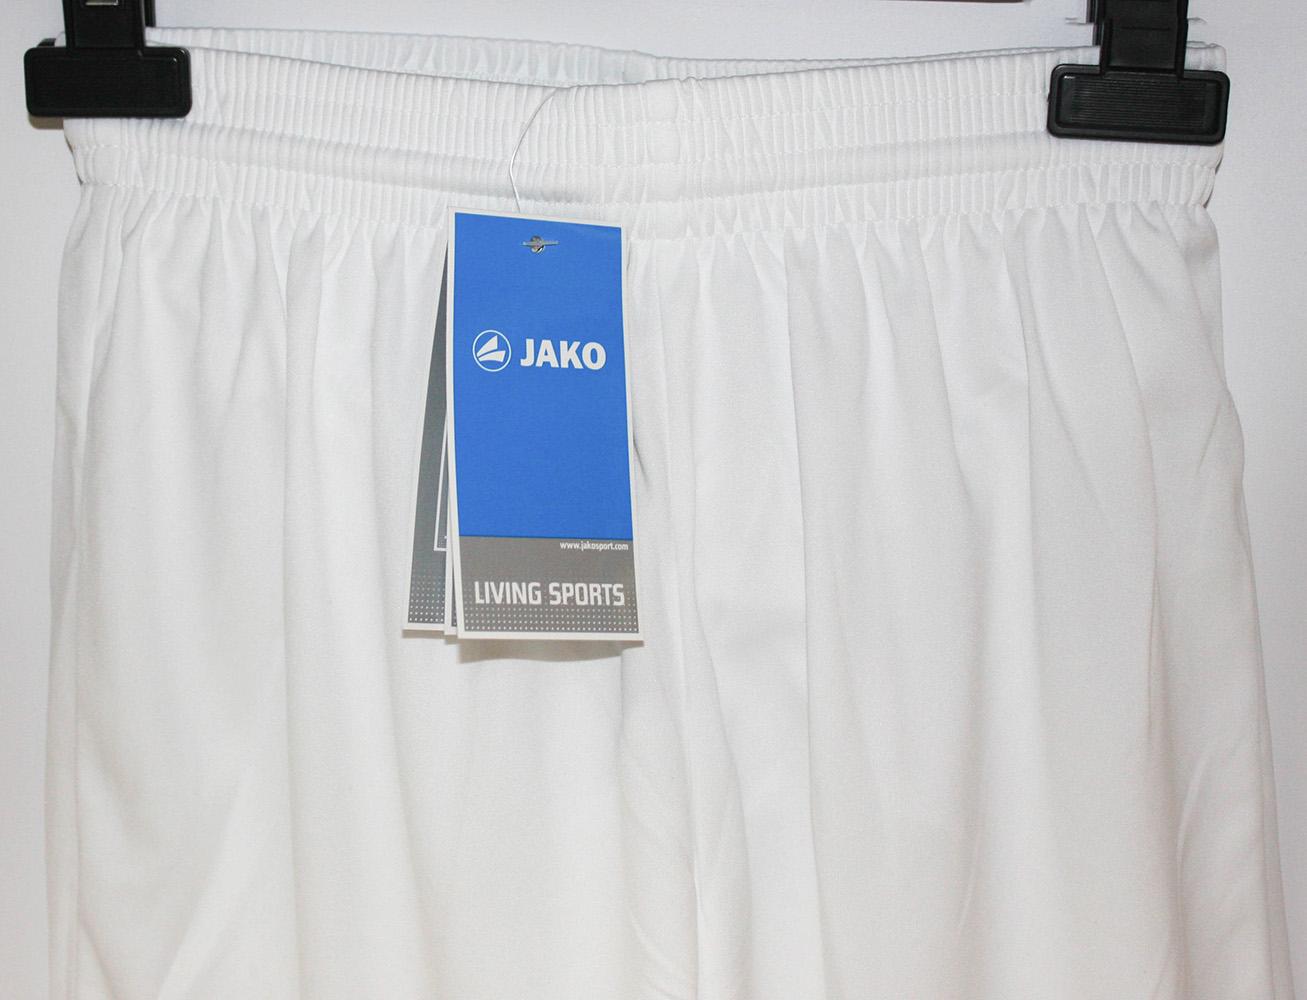 Jako pantalones de deporte palermo short niños breve pantalones de deporte blanco 4409-00 Shorts